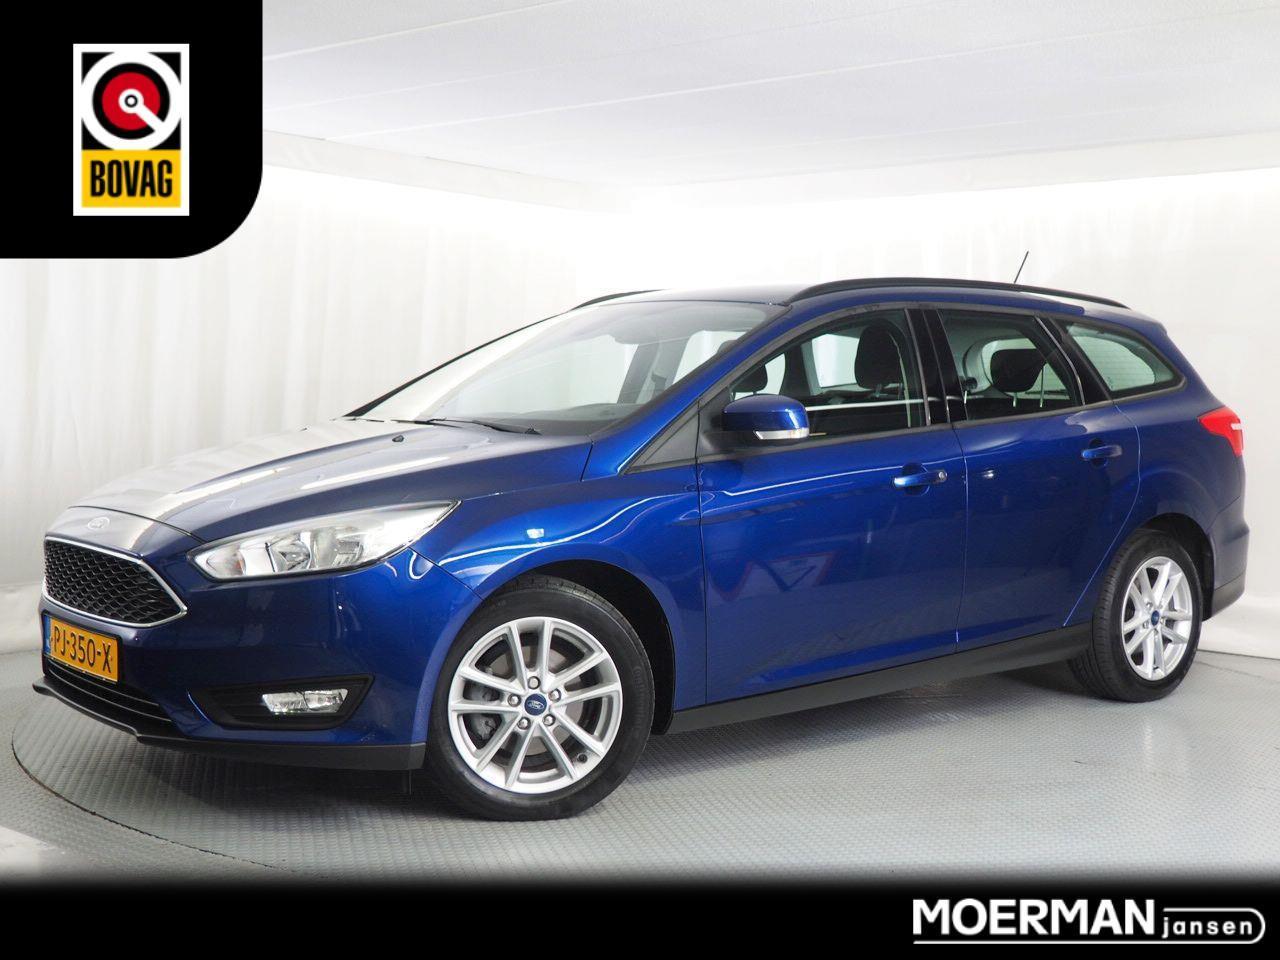 Ford Focus Wagon 125 pk edition / station / navigatie / 1e eigenaar / trekhaak /